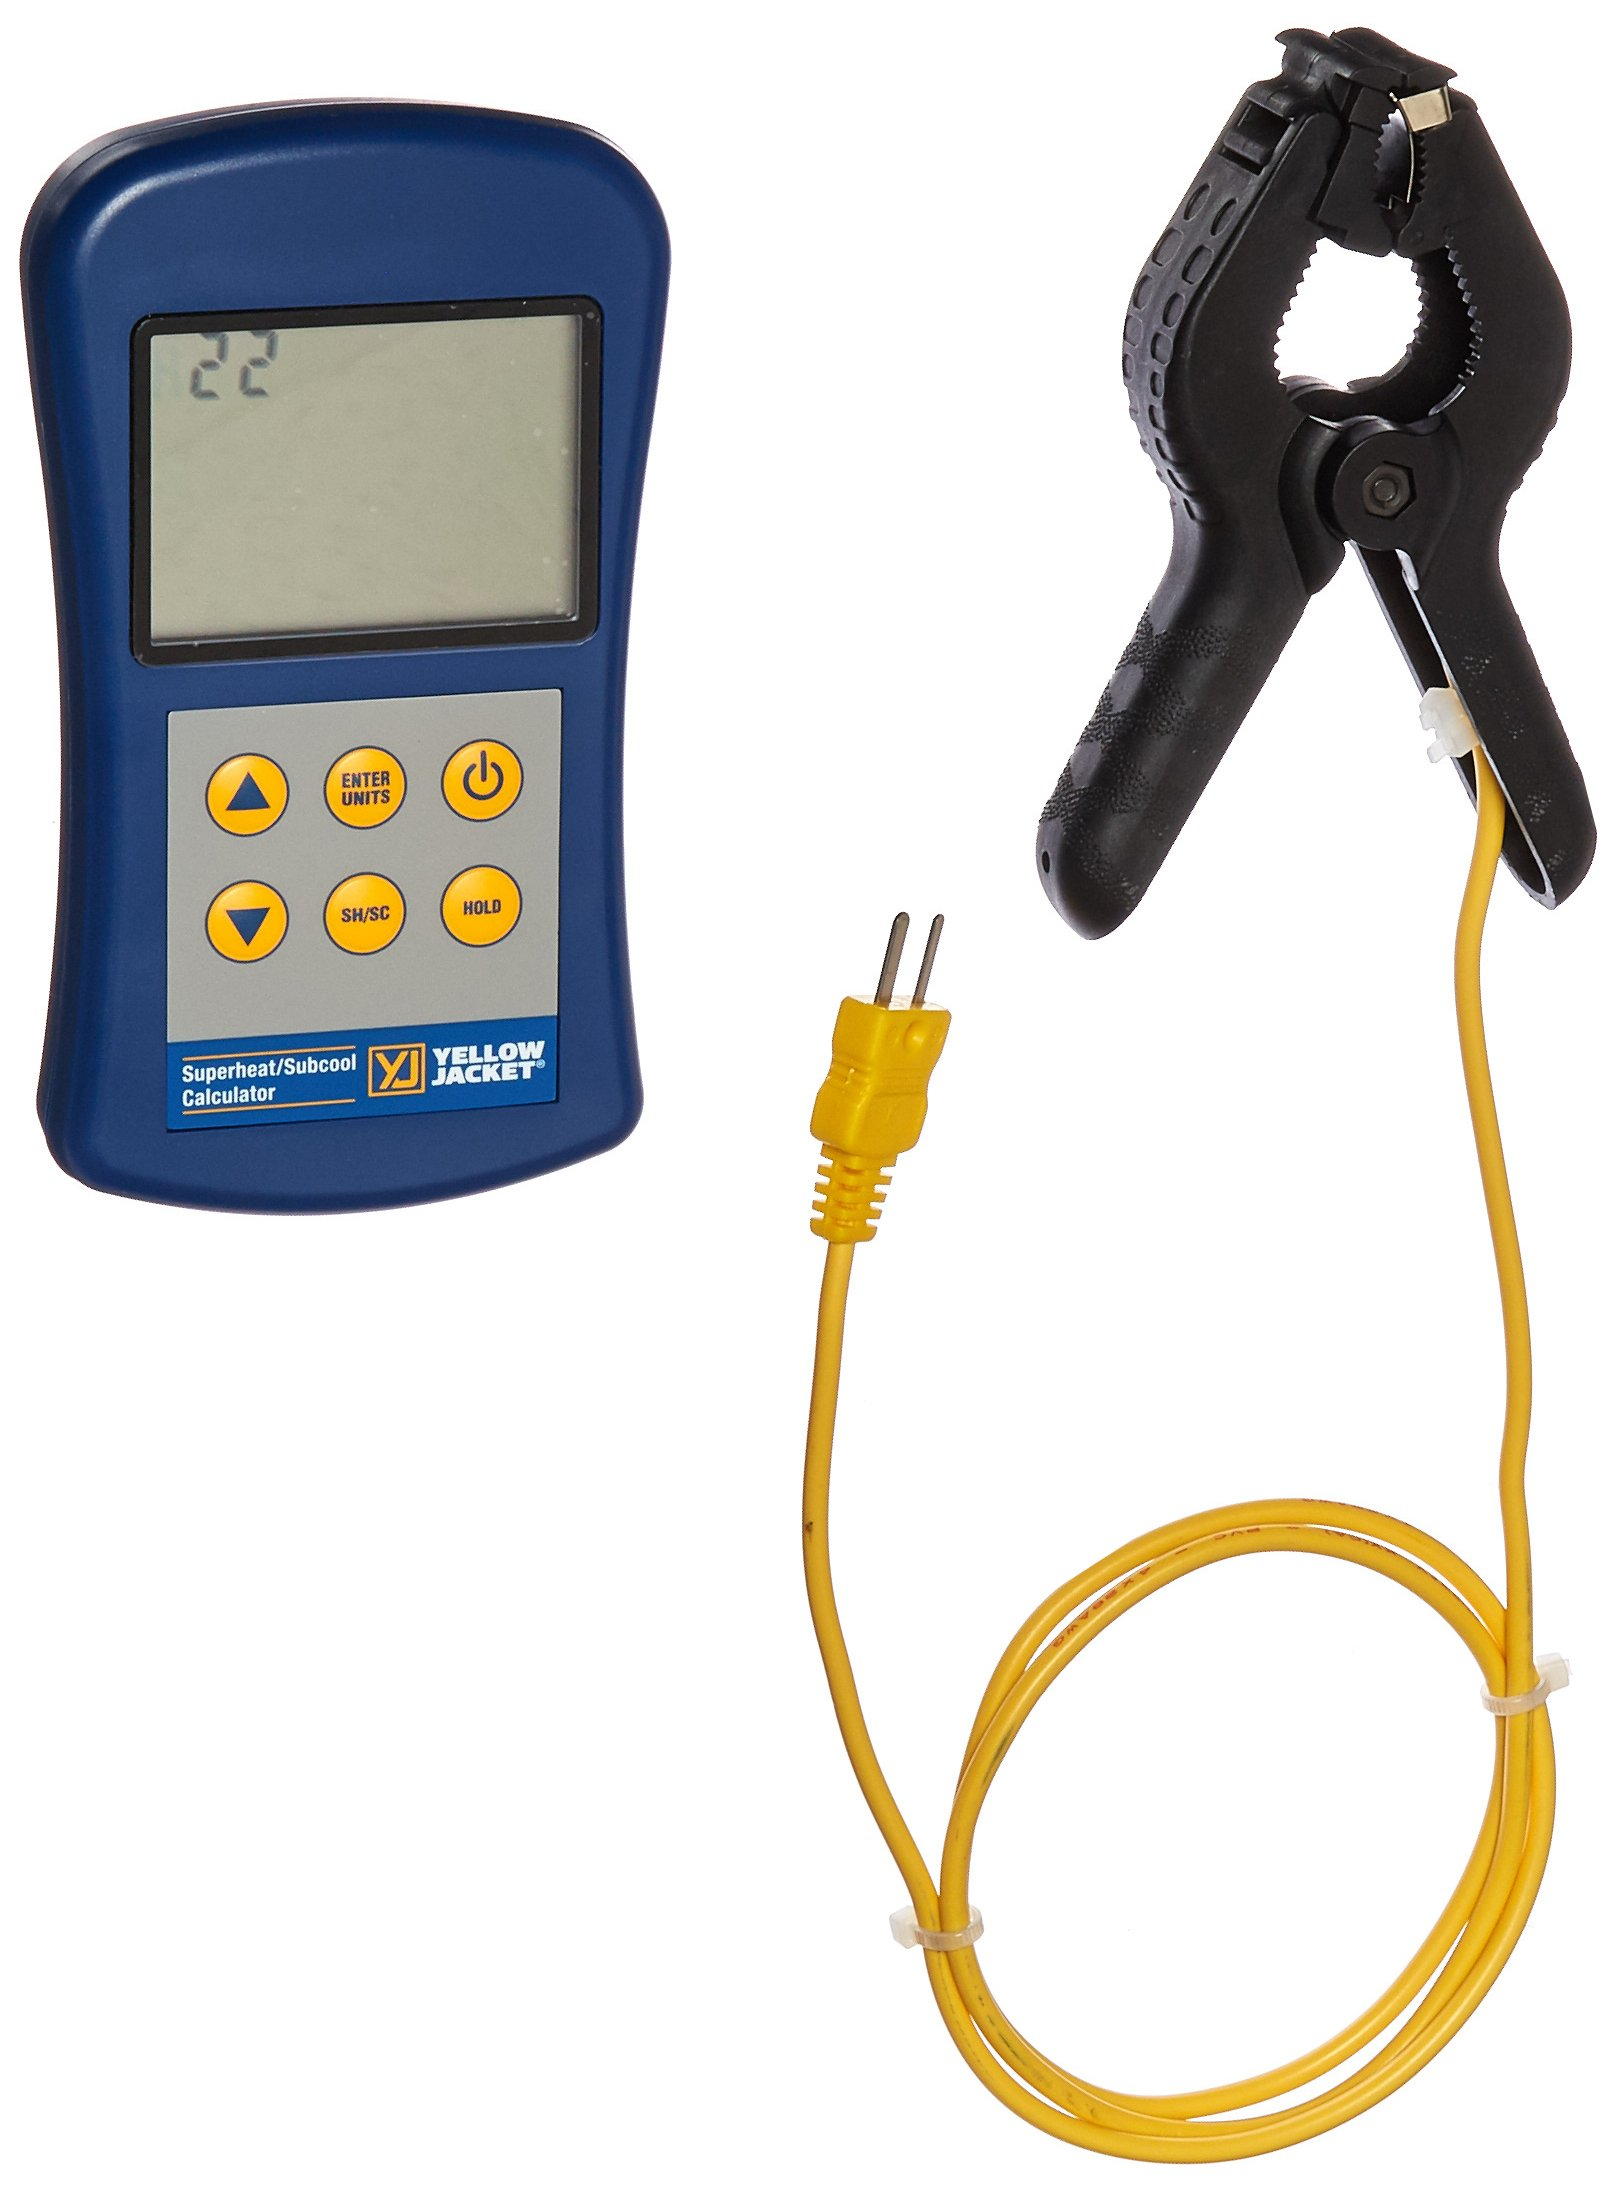 Yellow Jacket 69196 Superheat/SubCool Calculator by Yellow Jacket